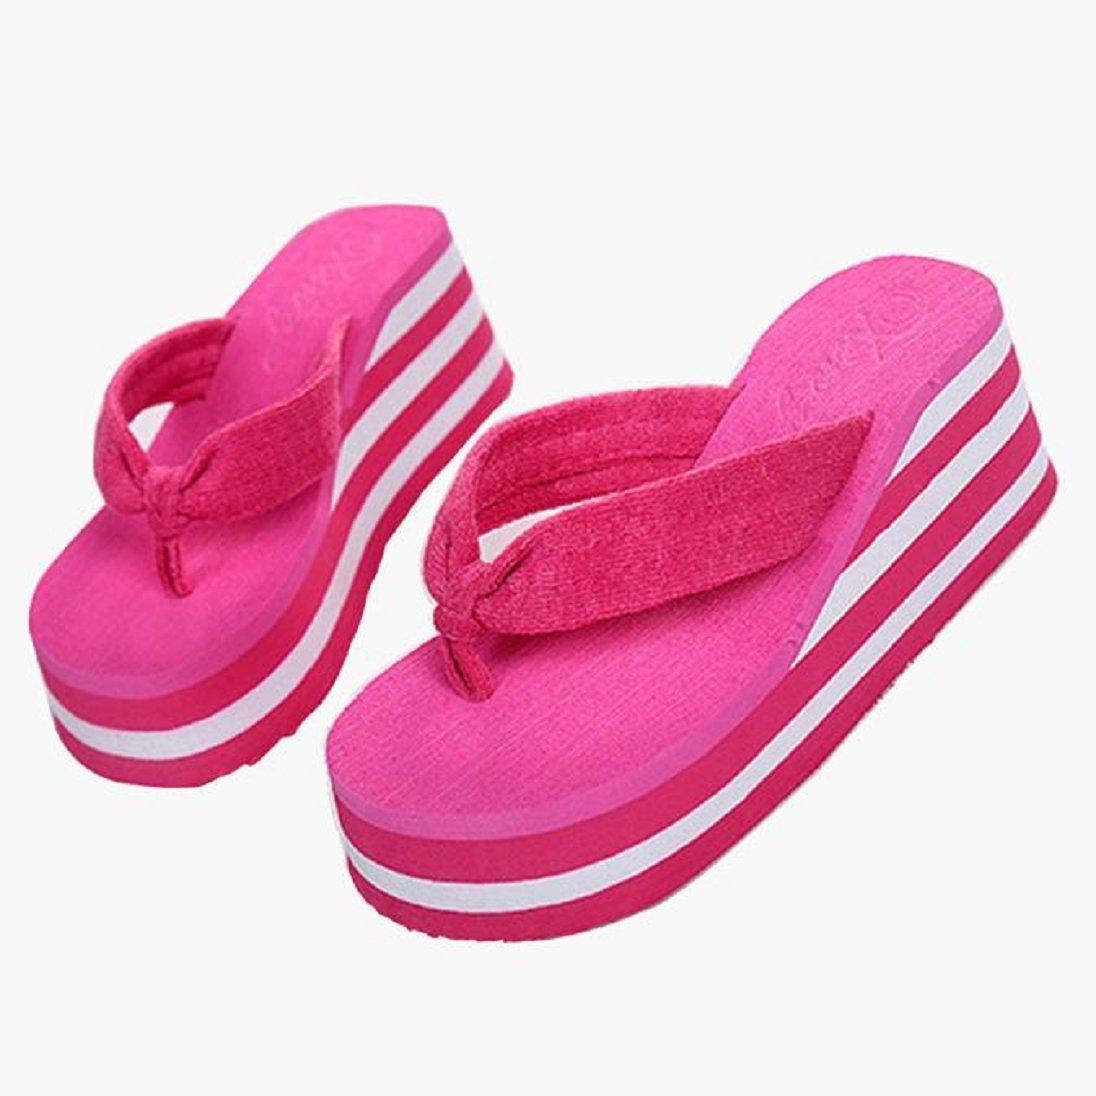 18b1bd47d446c2 Get Quotations · AutumnFall® Summer Women s Havana Wedge Flip-Flop